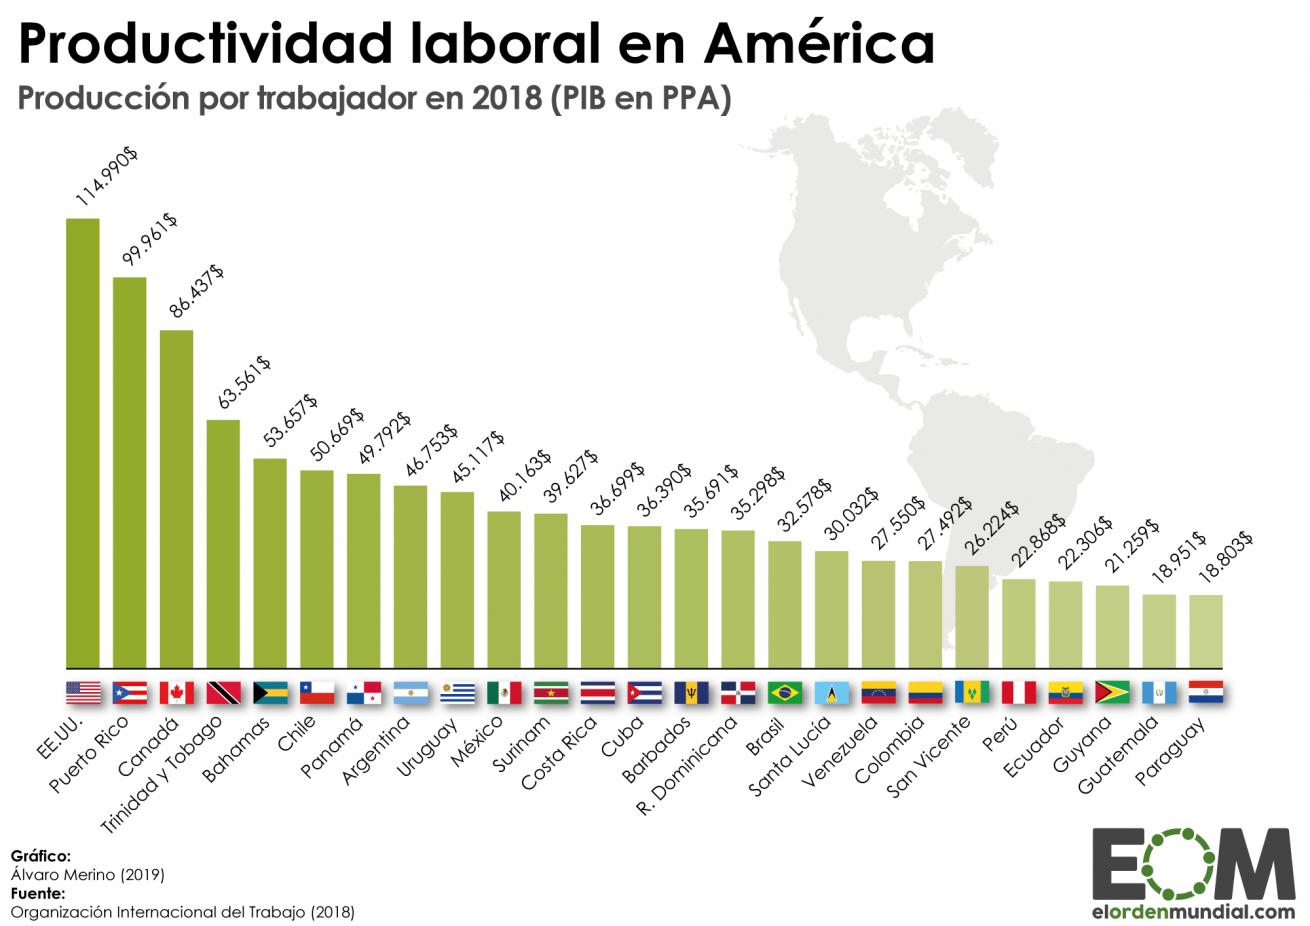 Productividad laboral países América Latina